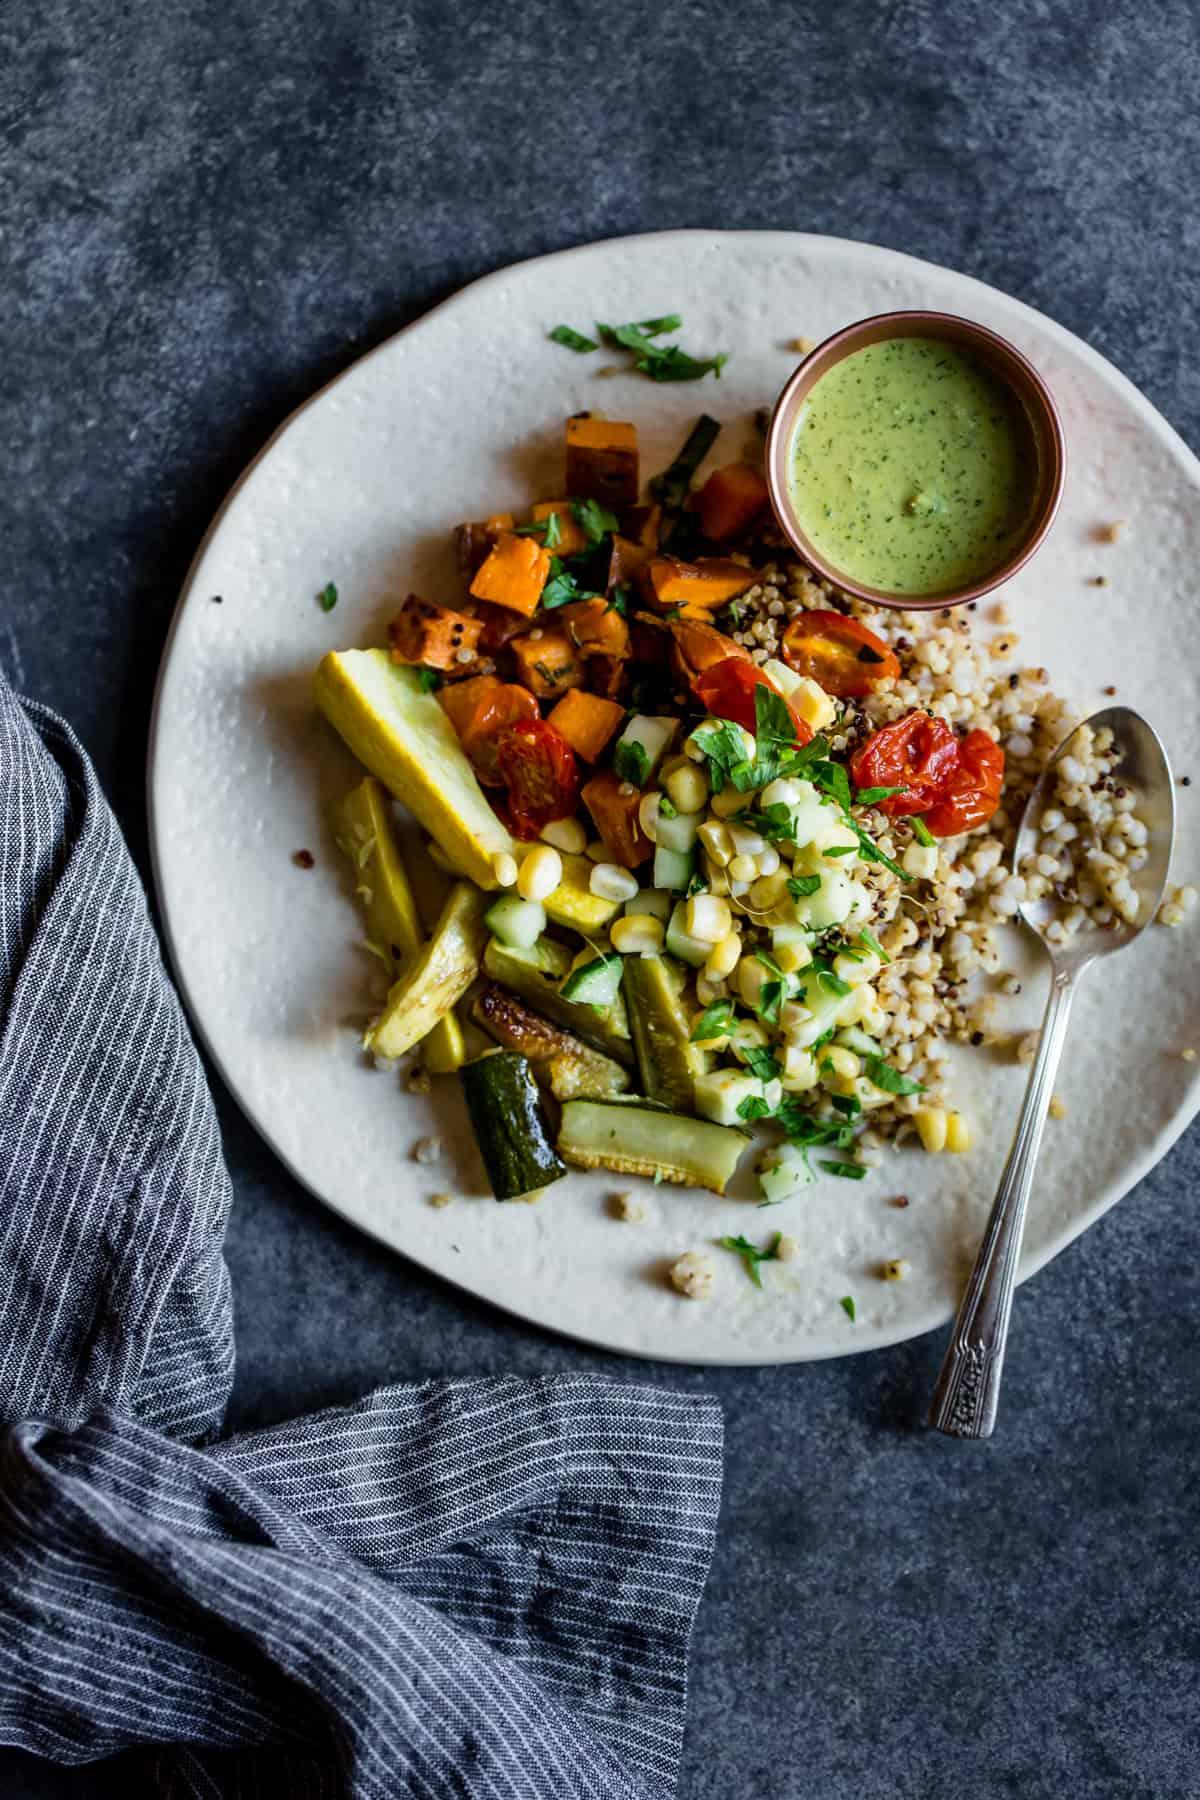 veg on plate